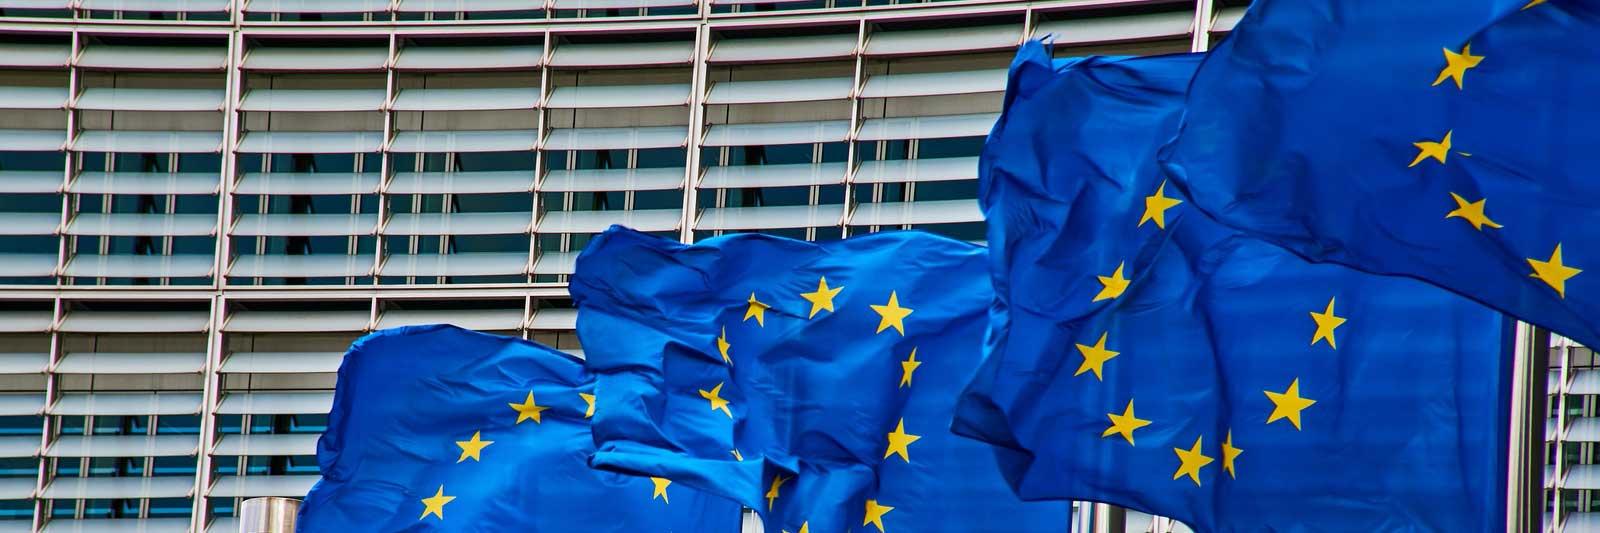 EU - Recovery Fund